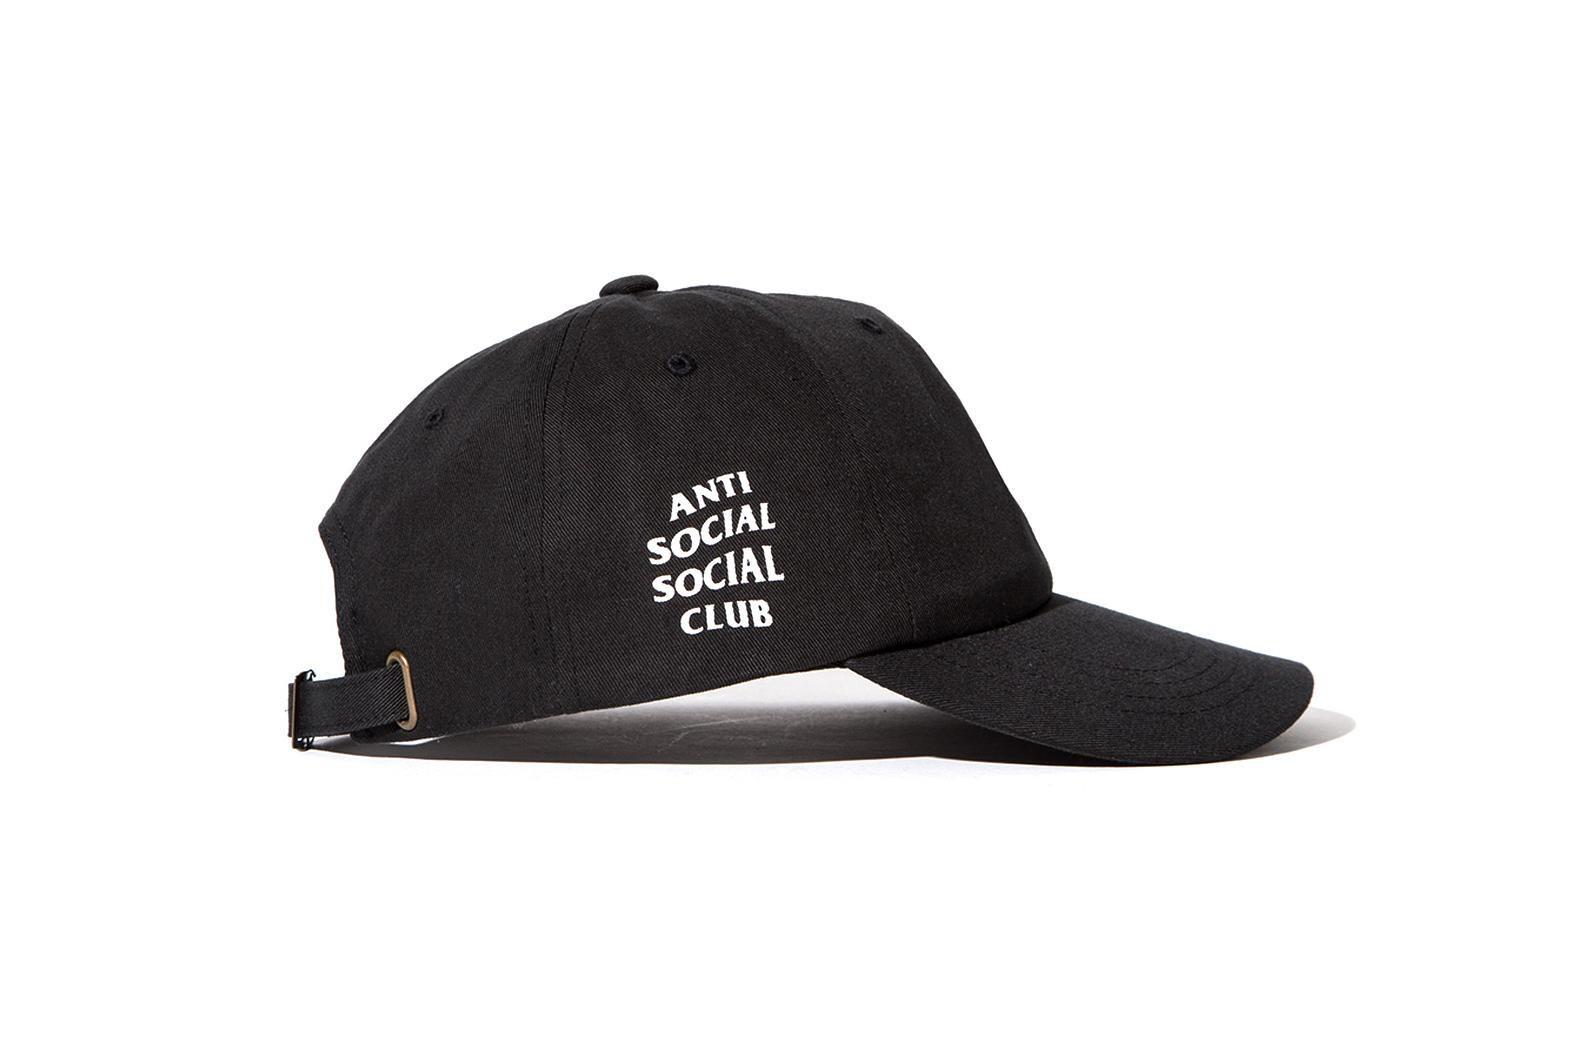 Anti Social Social Club x mastermind JAPAN      Capsule Collection     Hypebeast